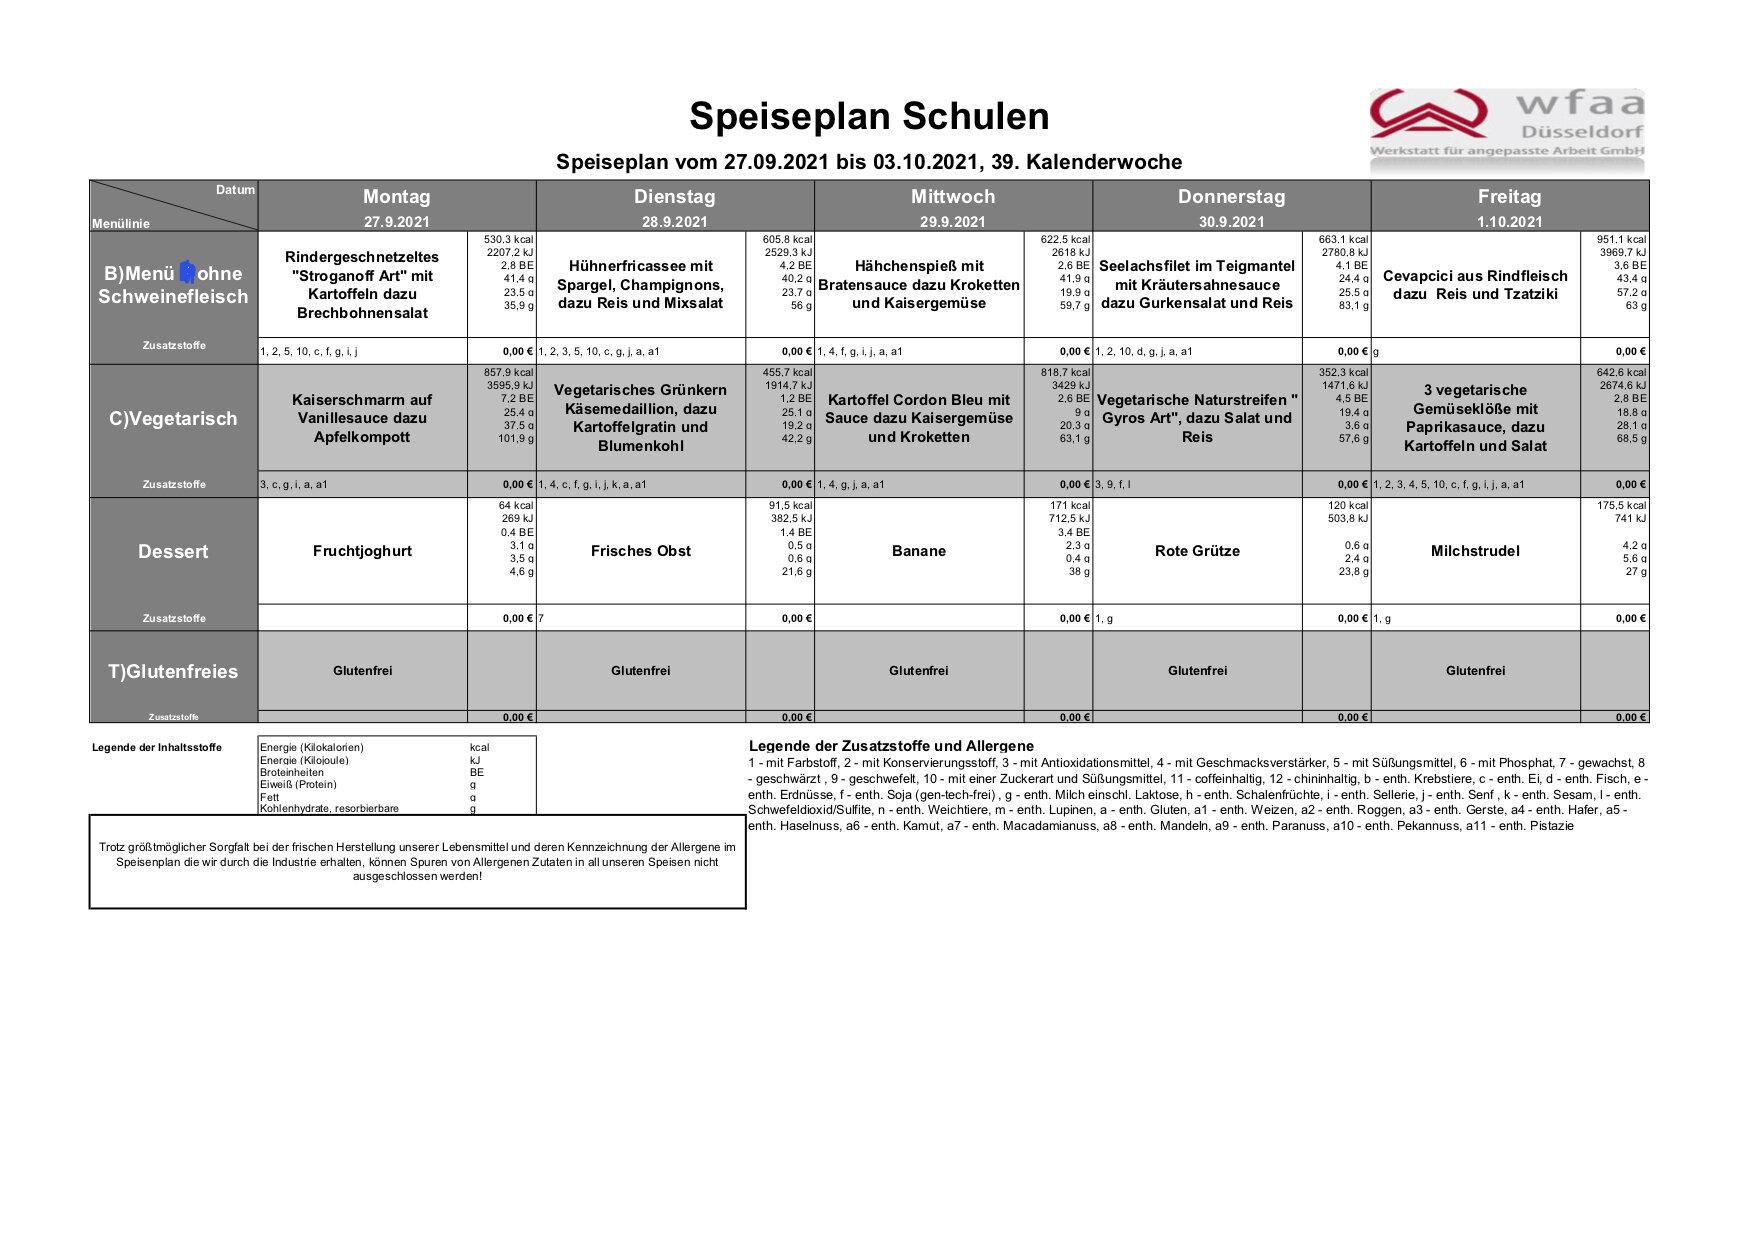 Speiseplan 27.09. - 03.10.2021 (KW 39)